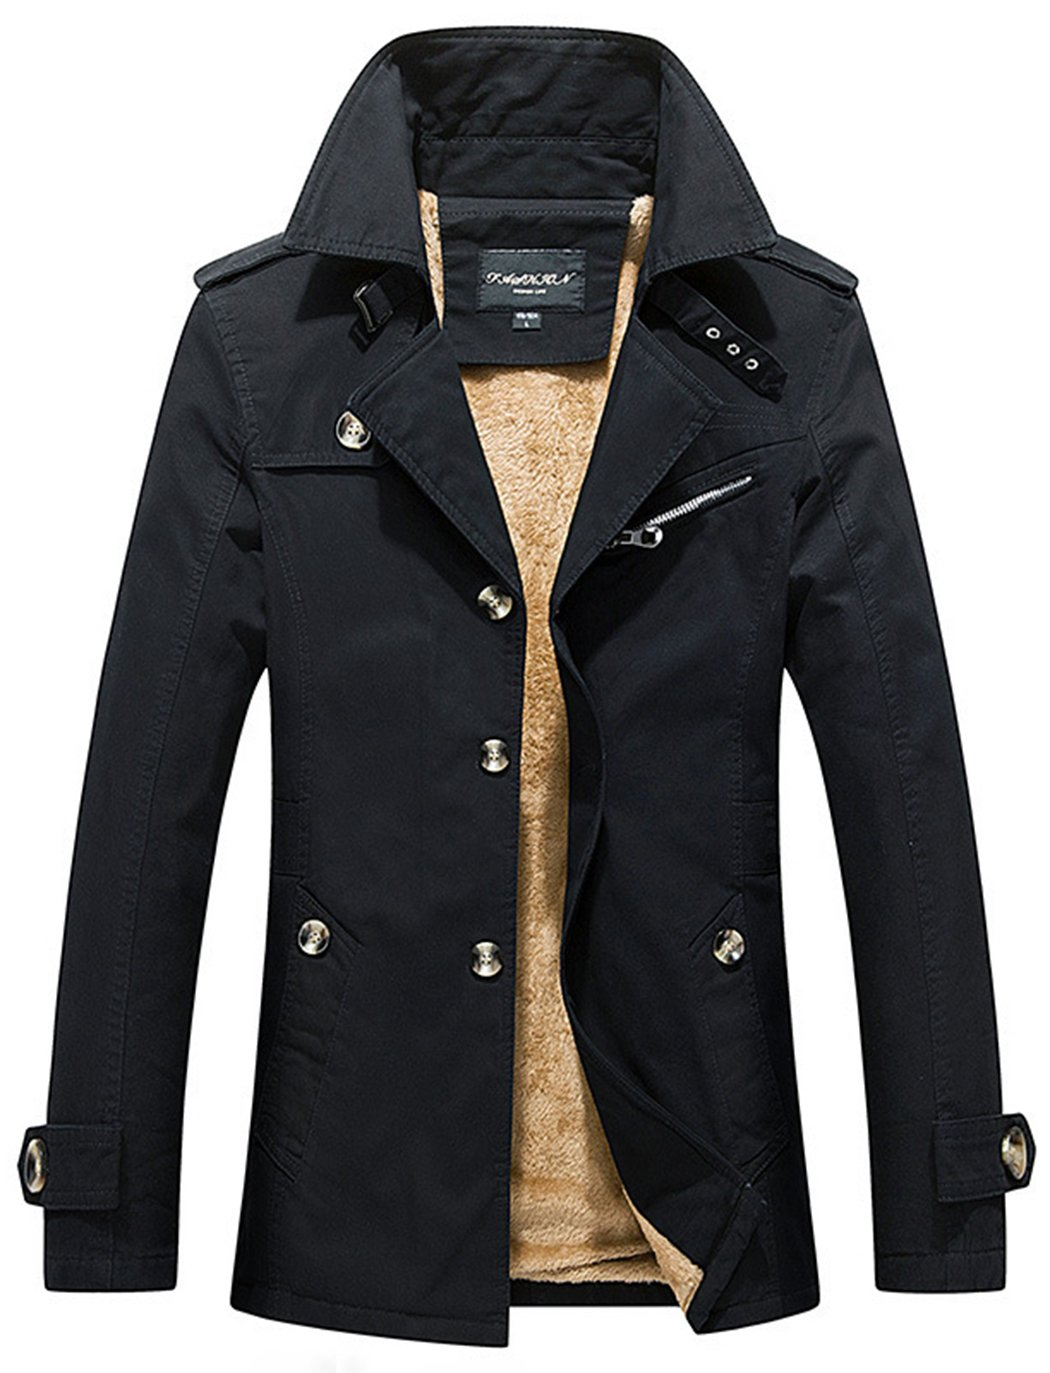 Sawadikaa Men's Single-Breast Lightweight Cotton Jacket Coat with Fleece Pea Coat Windbreaker Wind Trench Black Medium by Sawadikaa